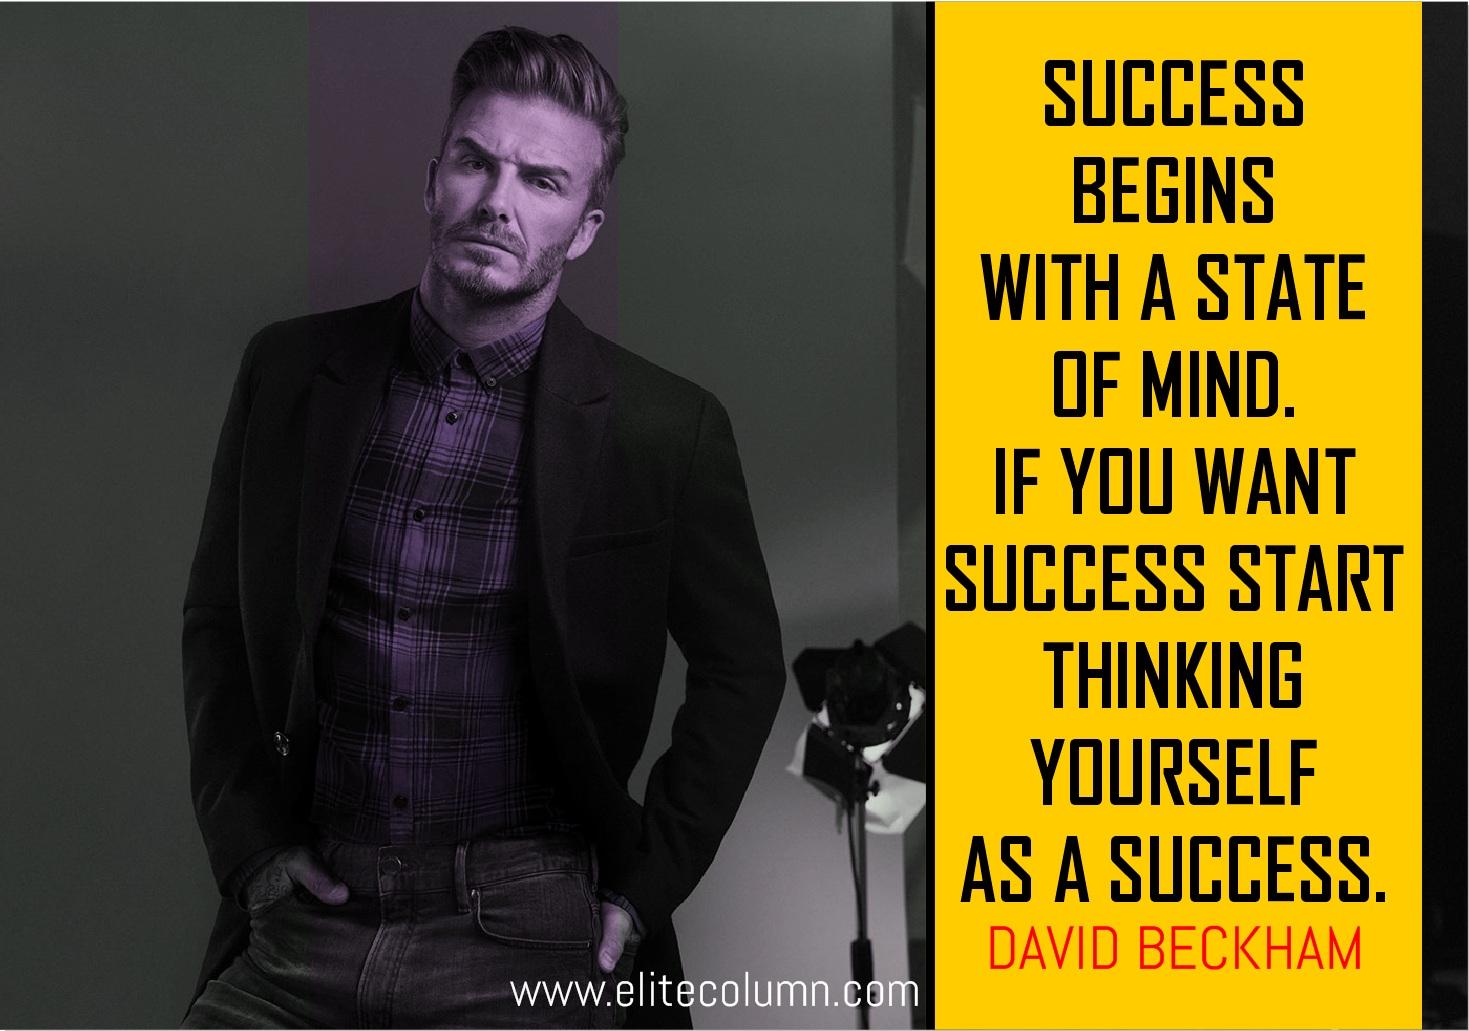 David Beckham Quotes (6)